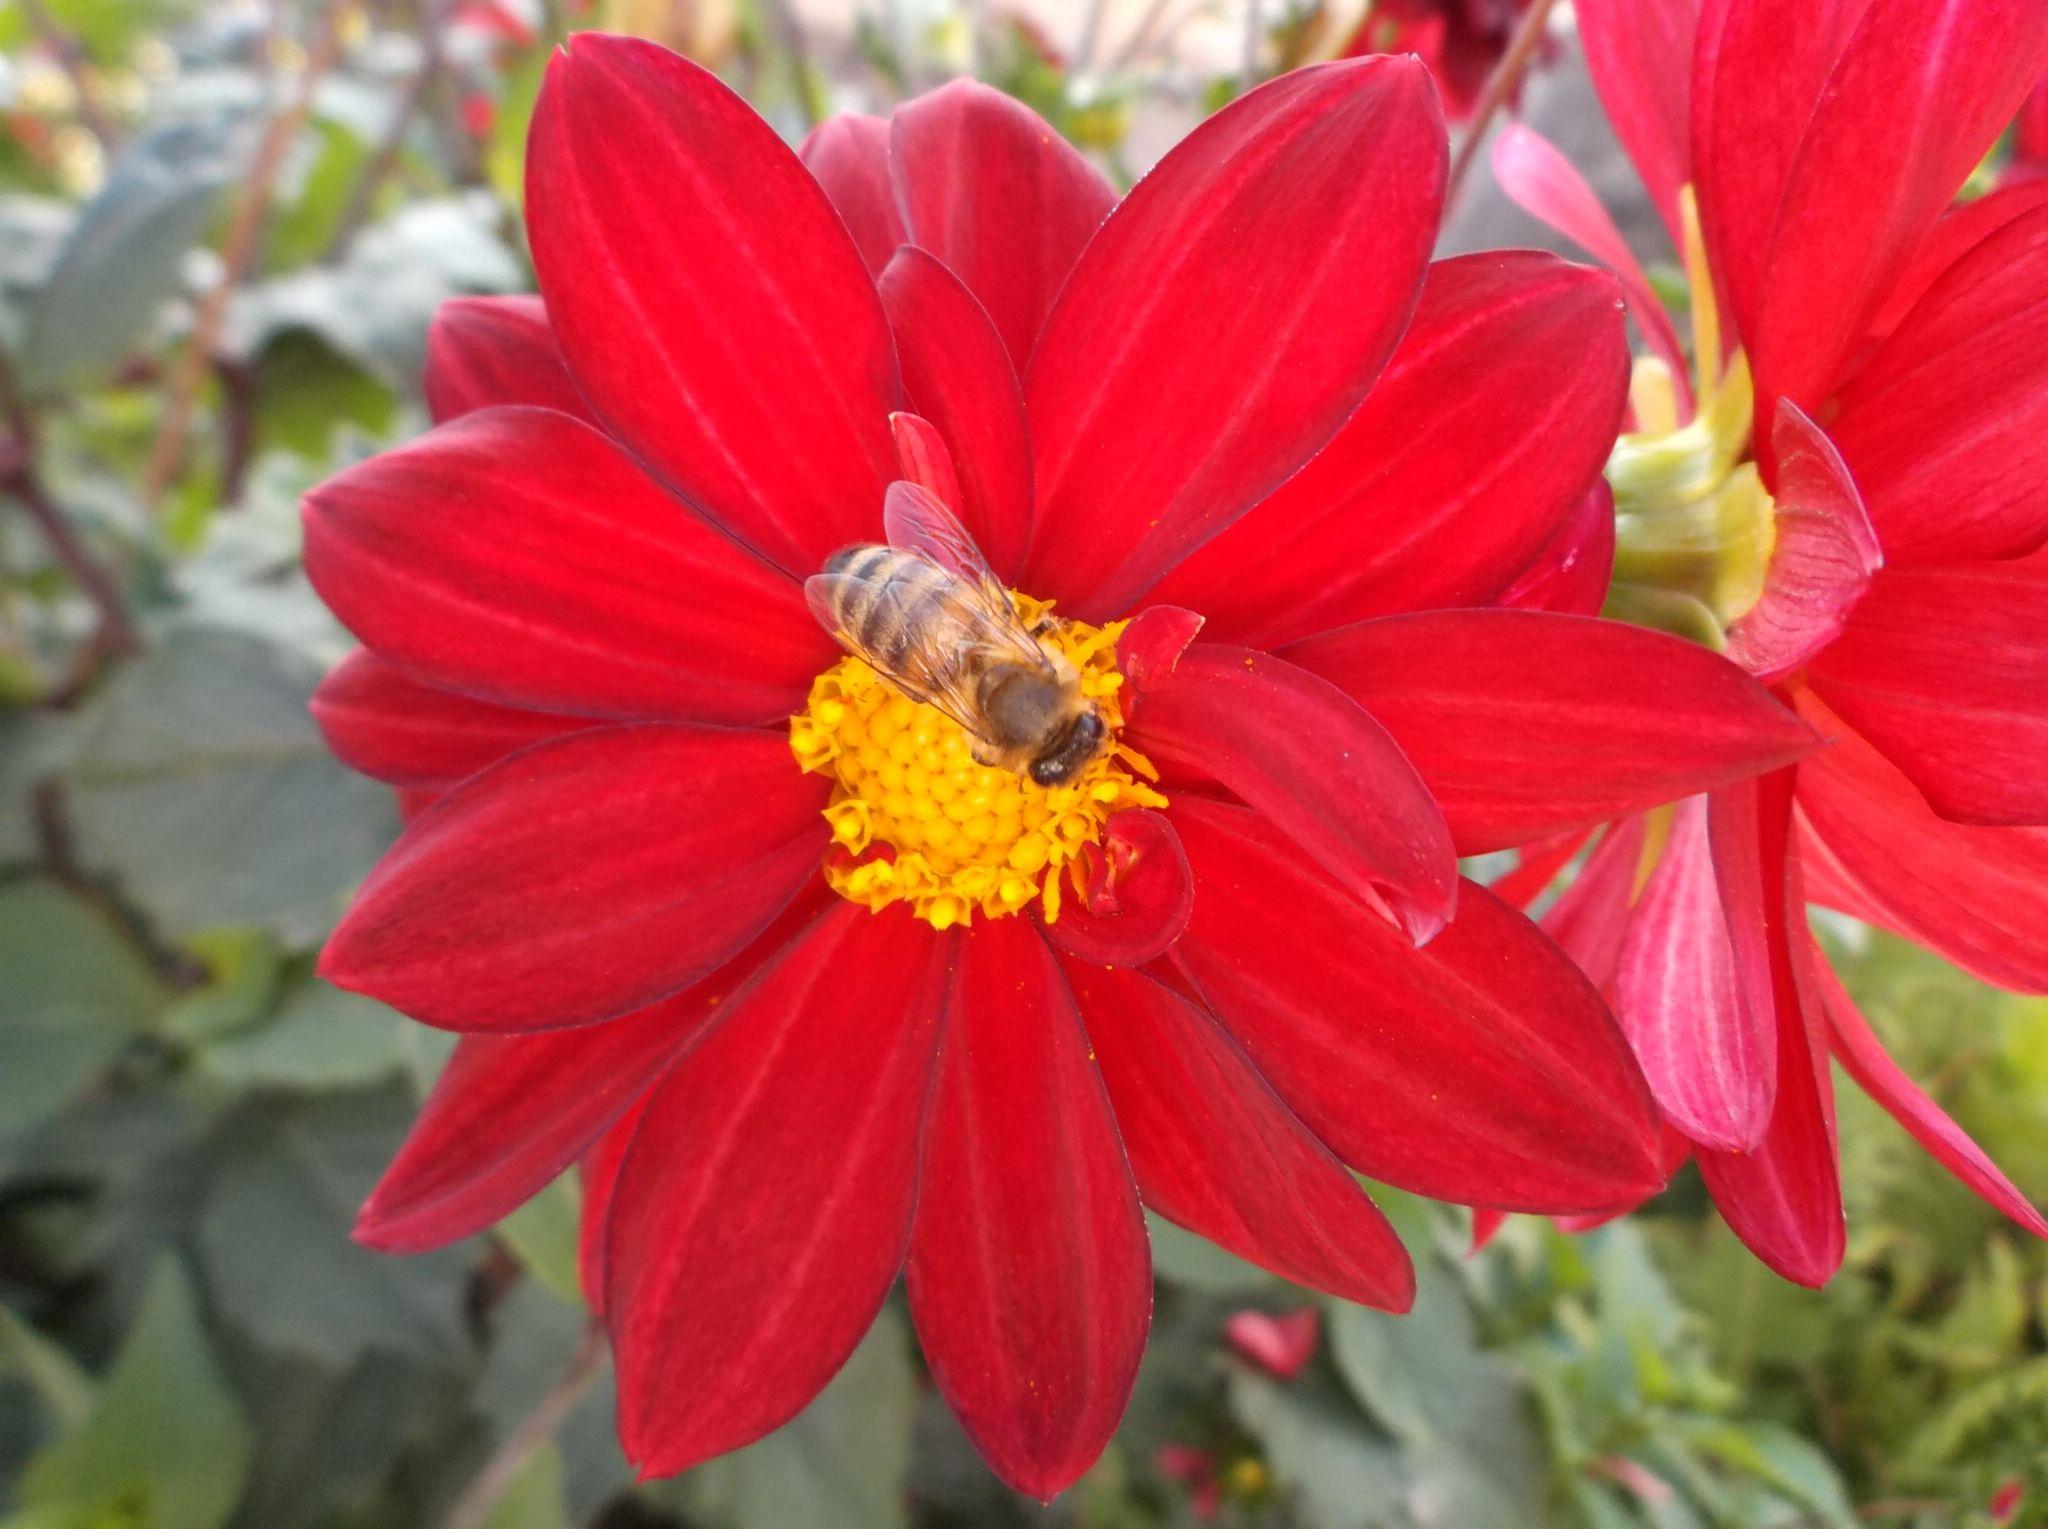 Bee and a flower. by Zita Užkuraitienė